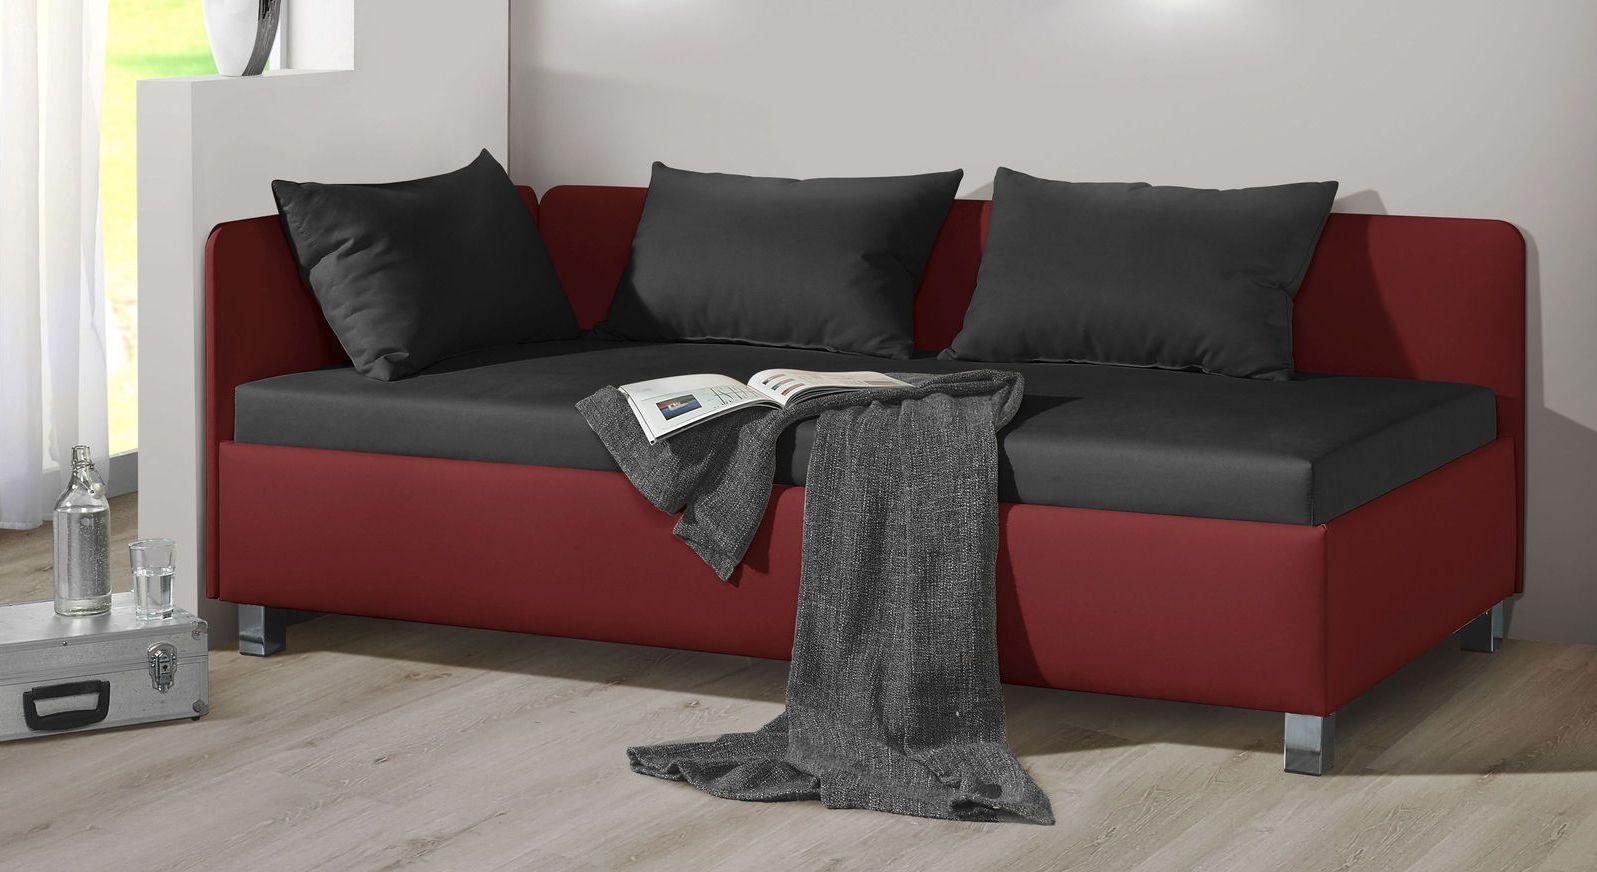 Studioliege Lisala aus dunkelrotem Kunstleder und schwarzem Microvelours